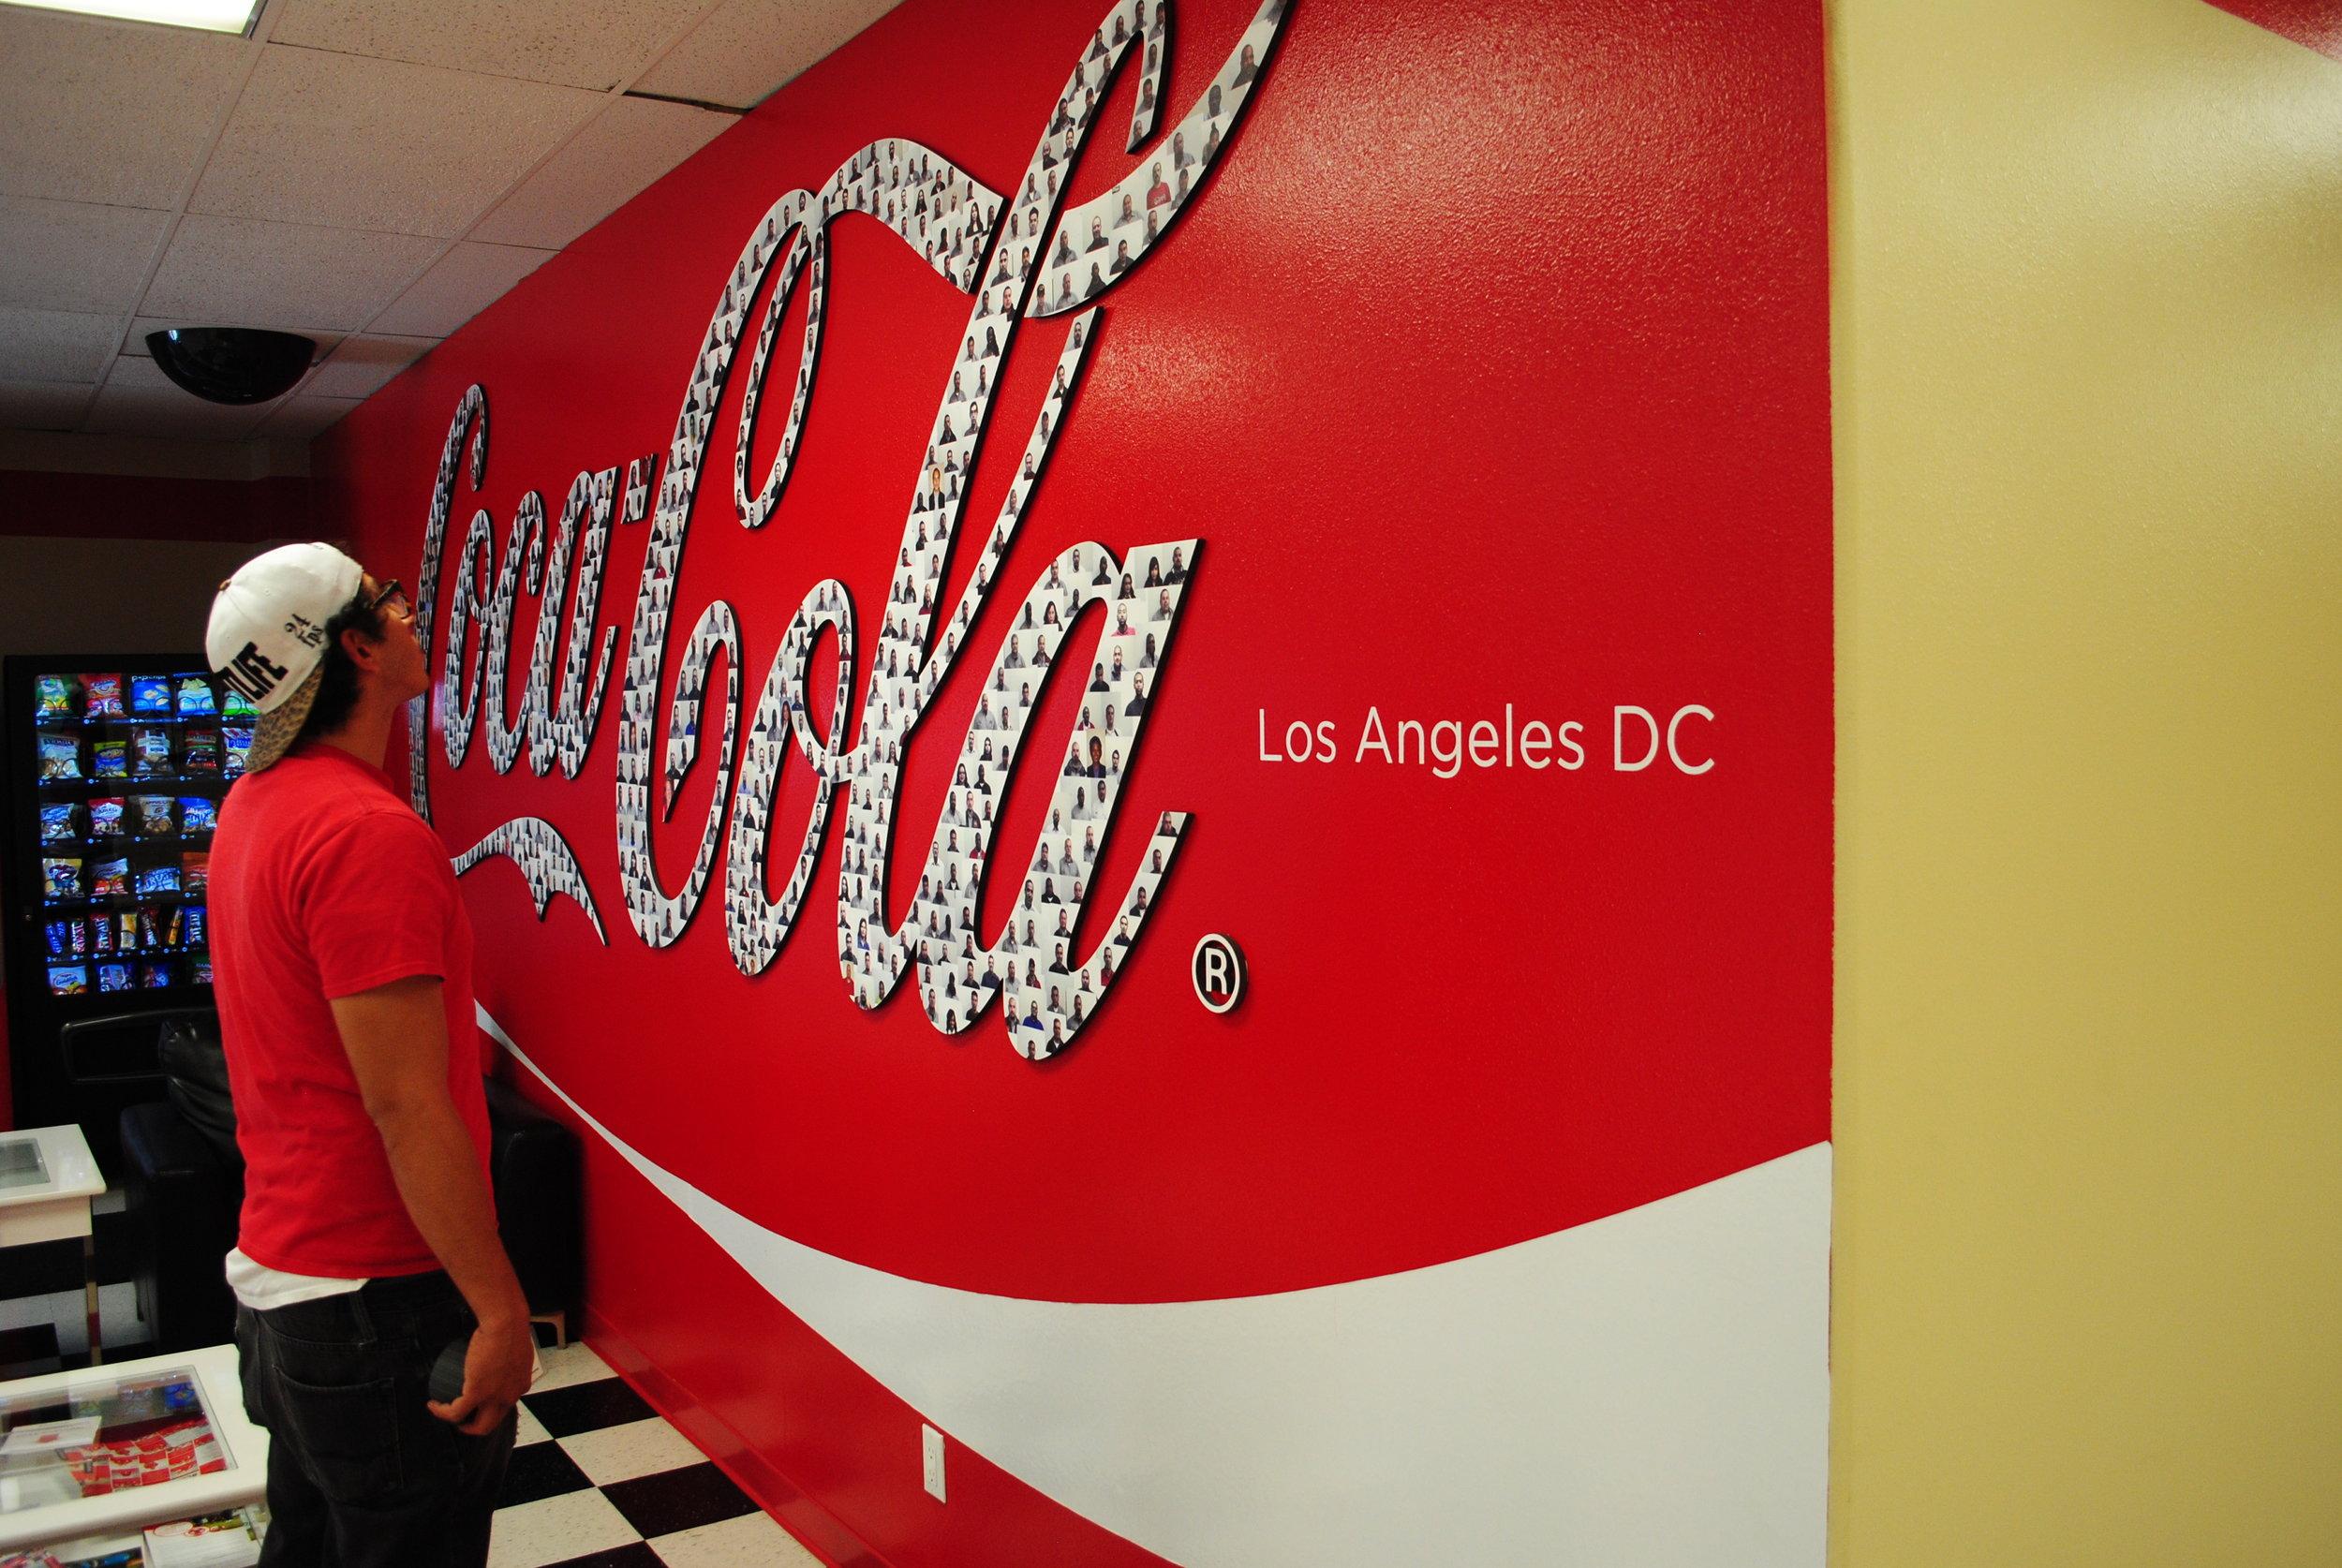 CocaCola_LogoCollage_2.JPG